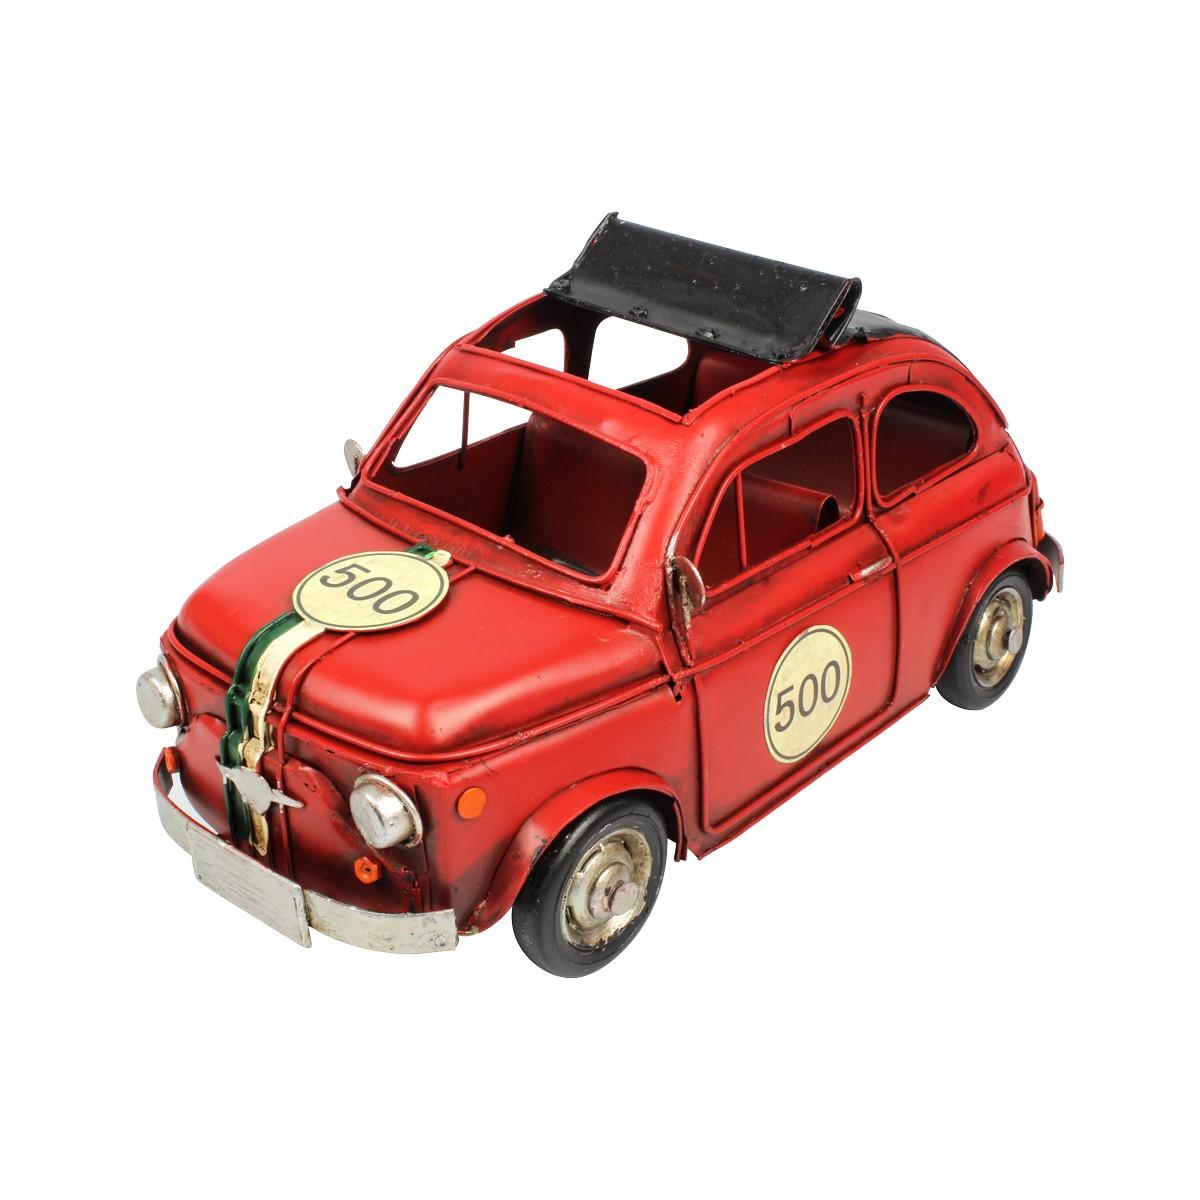 Miniatura De Metal Retrô Fiat 500 Vermelho